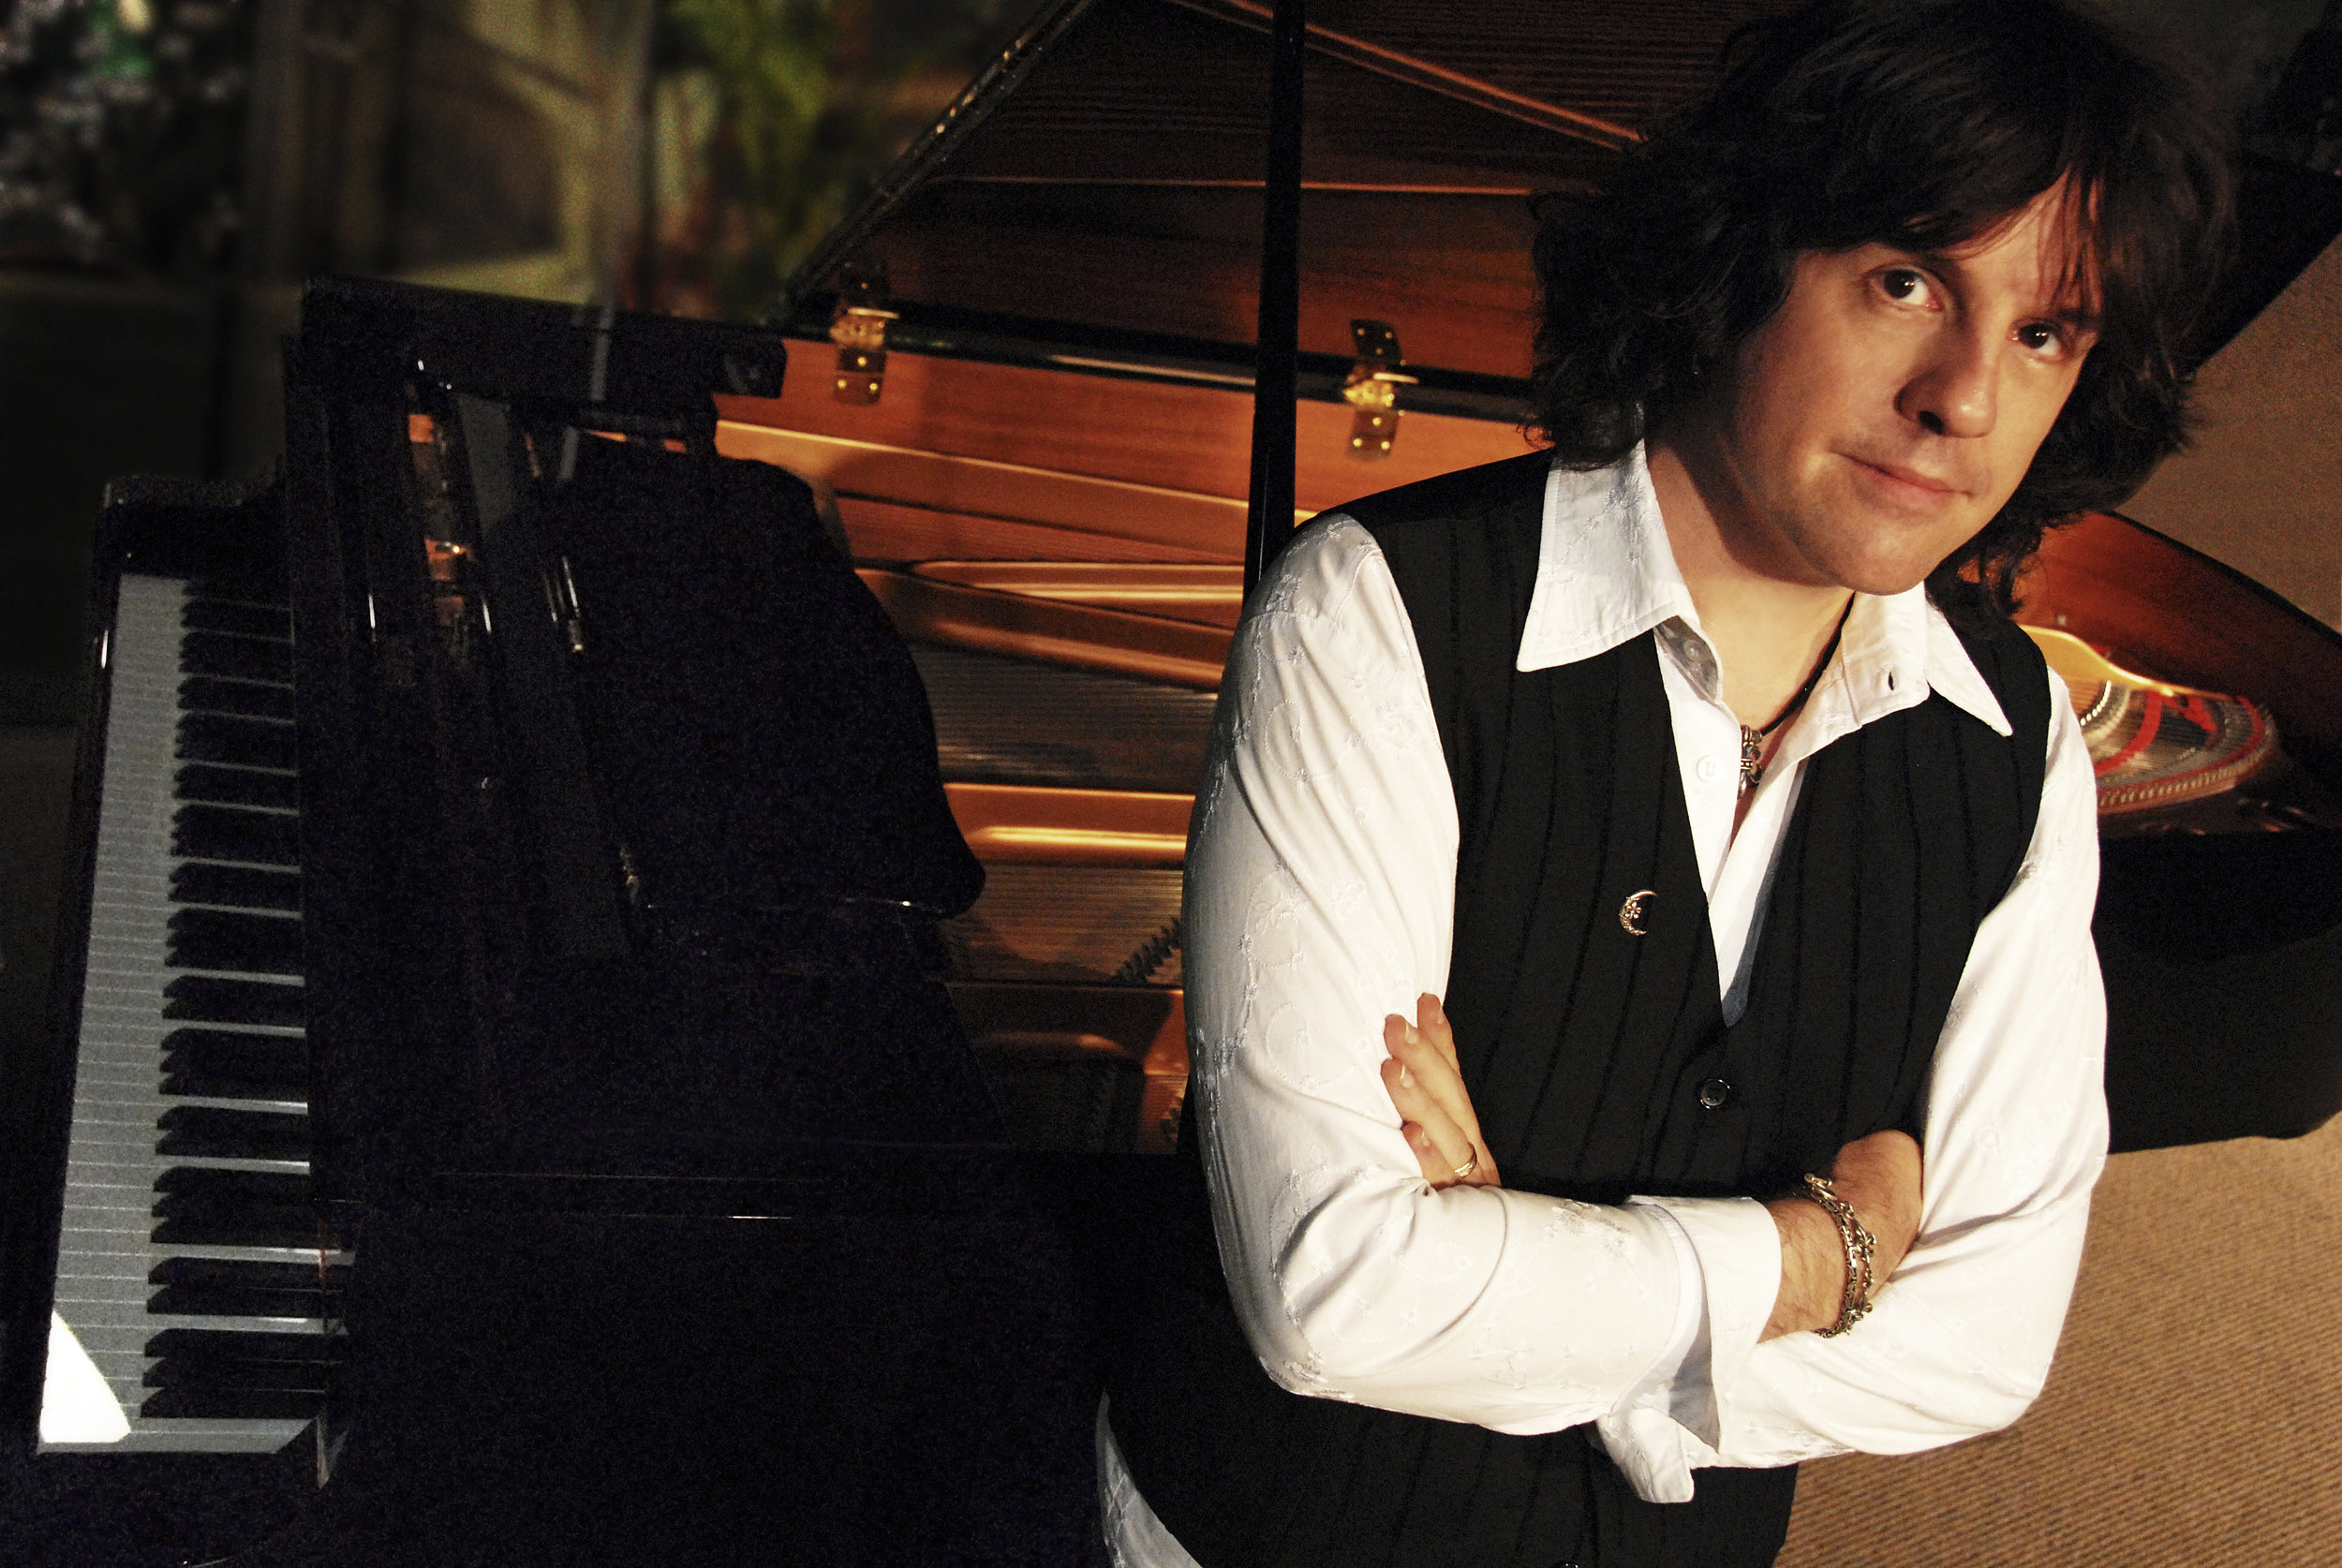 BobMalone_Piano_HiRes.jpg